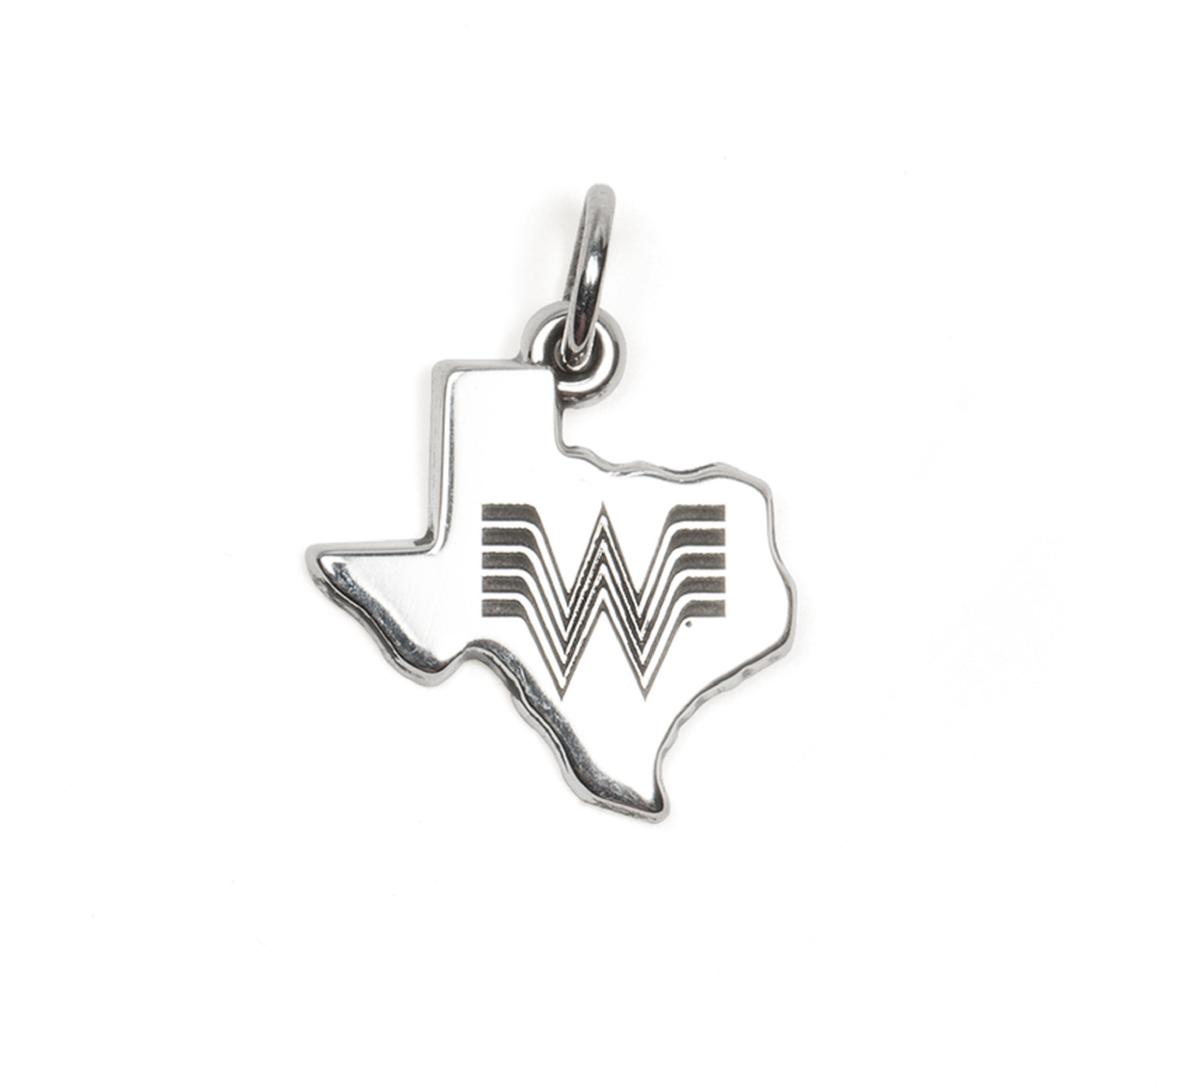 James Avery, Whataburger create silver charm | Local News ...